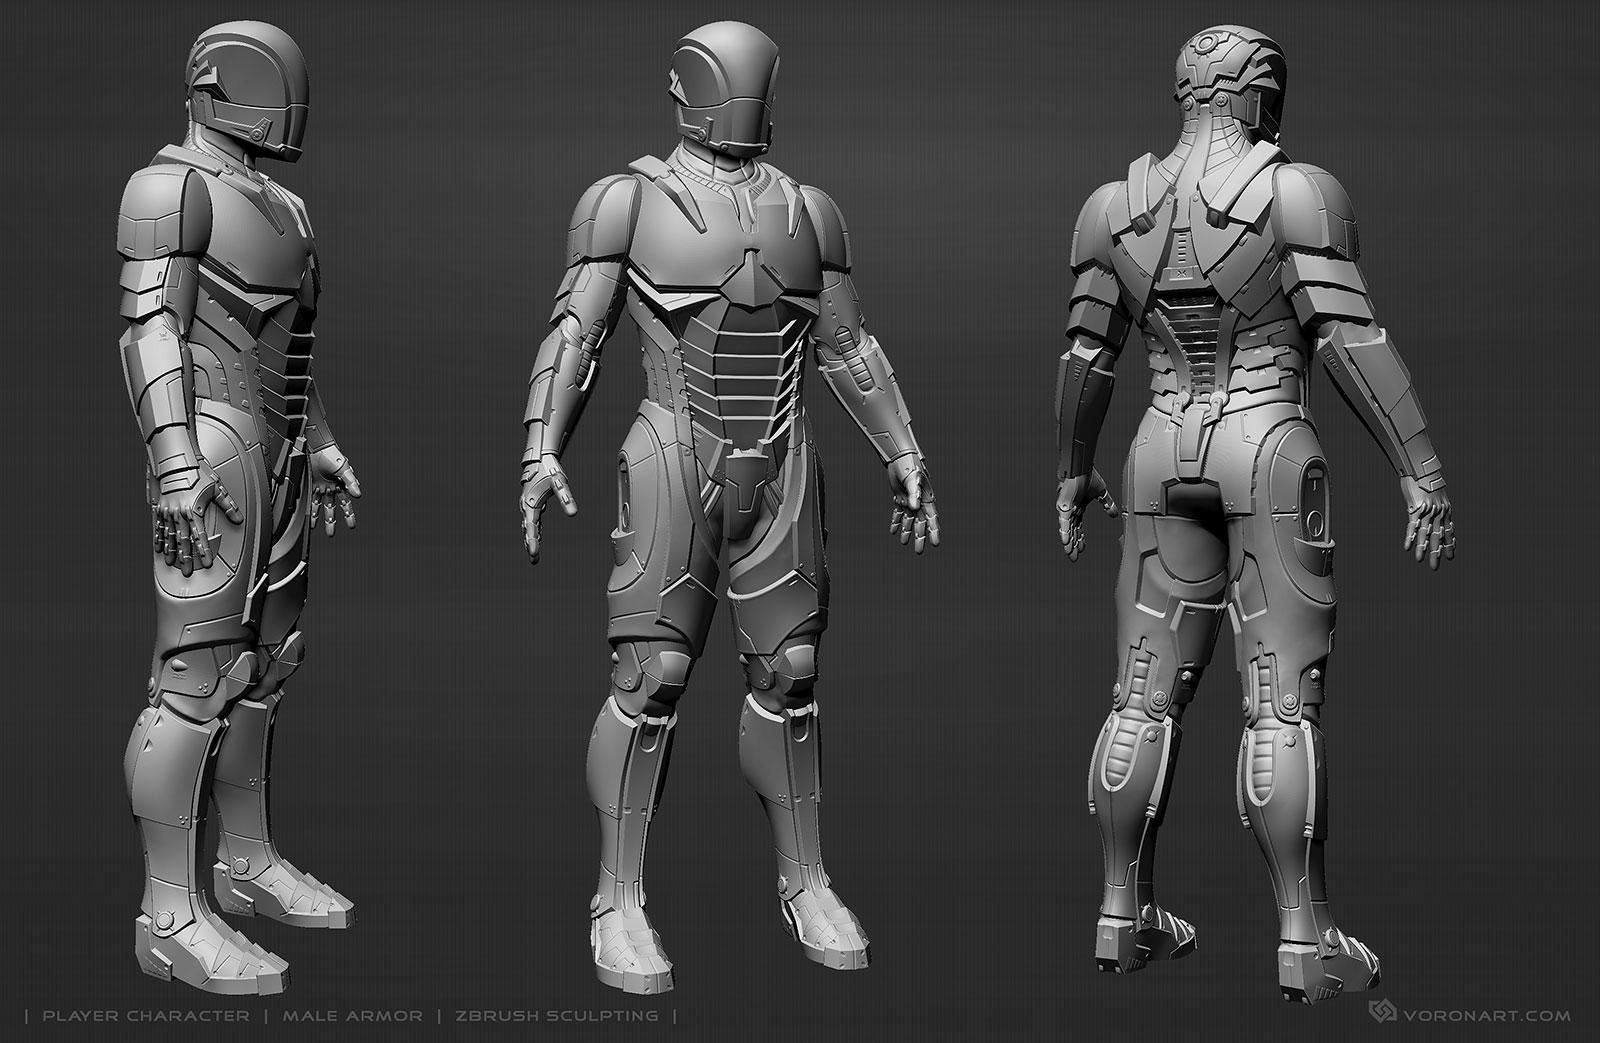 Iron Man Suit Design Software